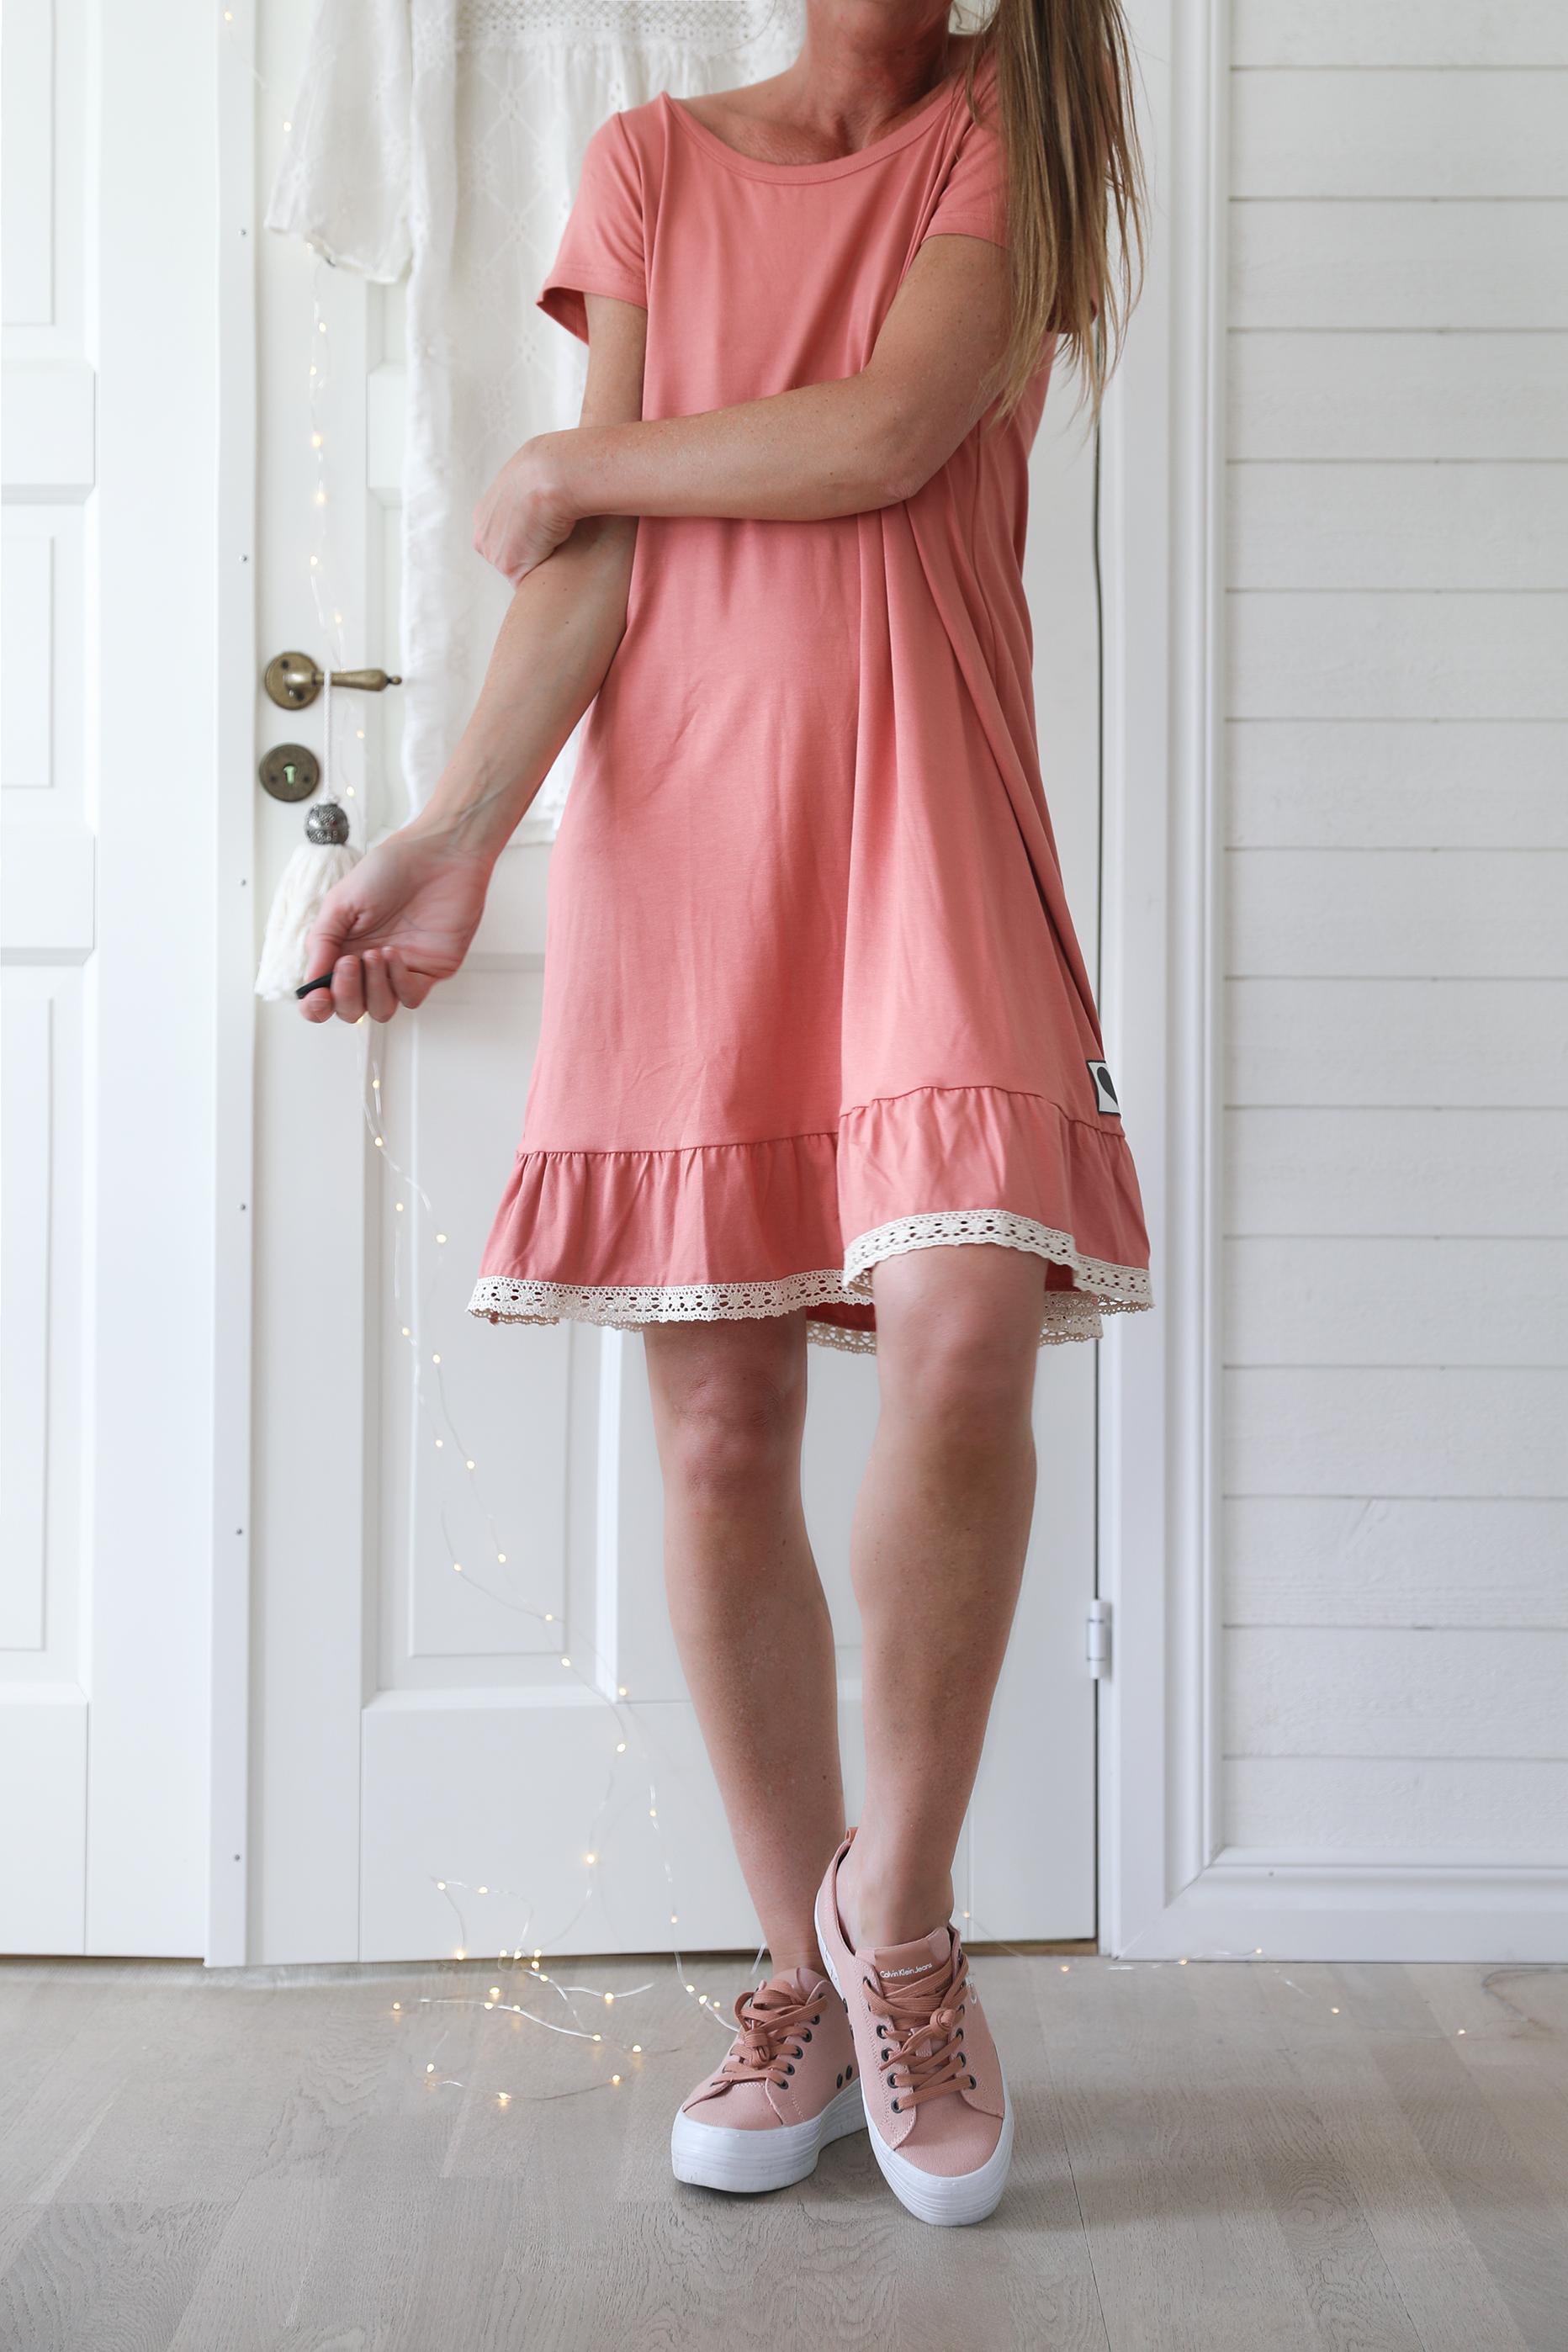 Blooming Malva klänning rosig persika Bloomingshop.se